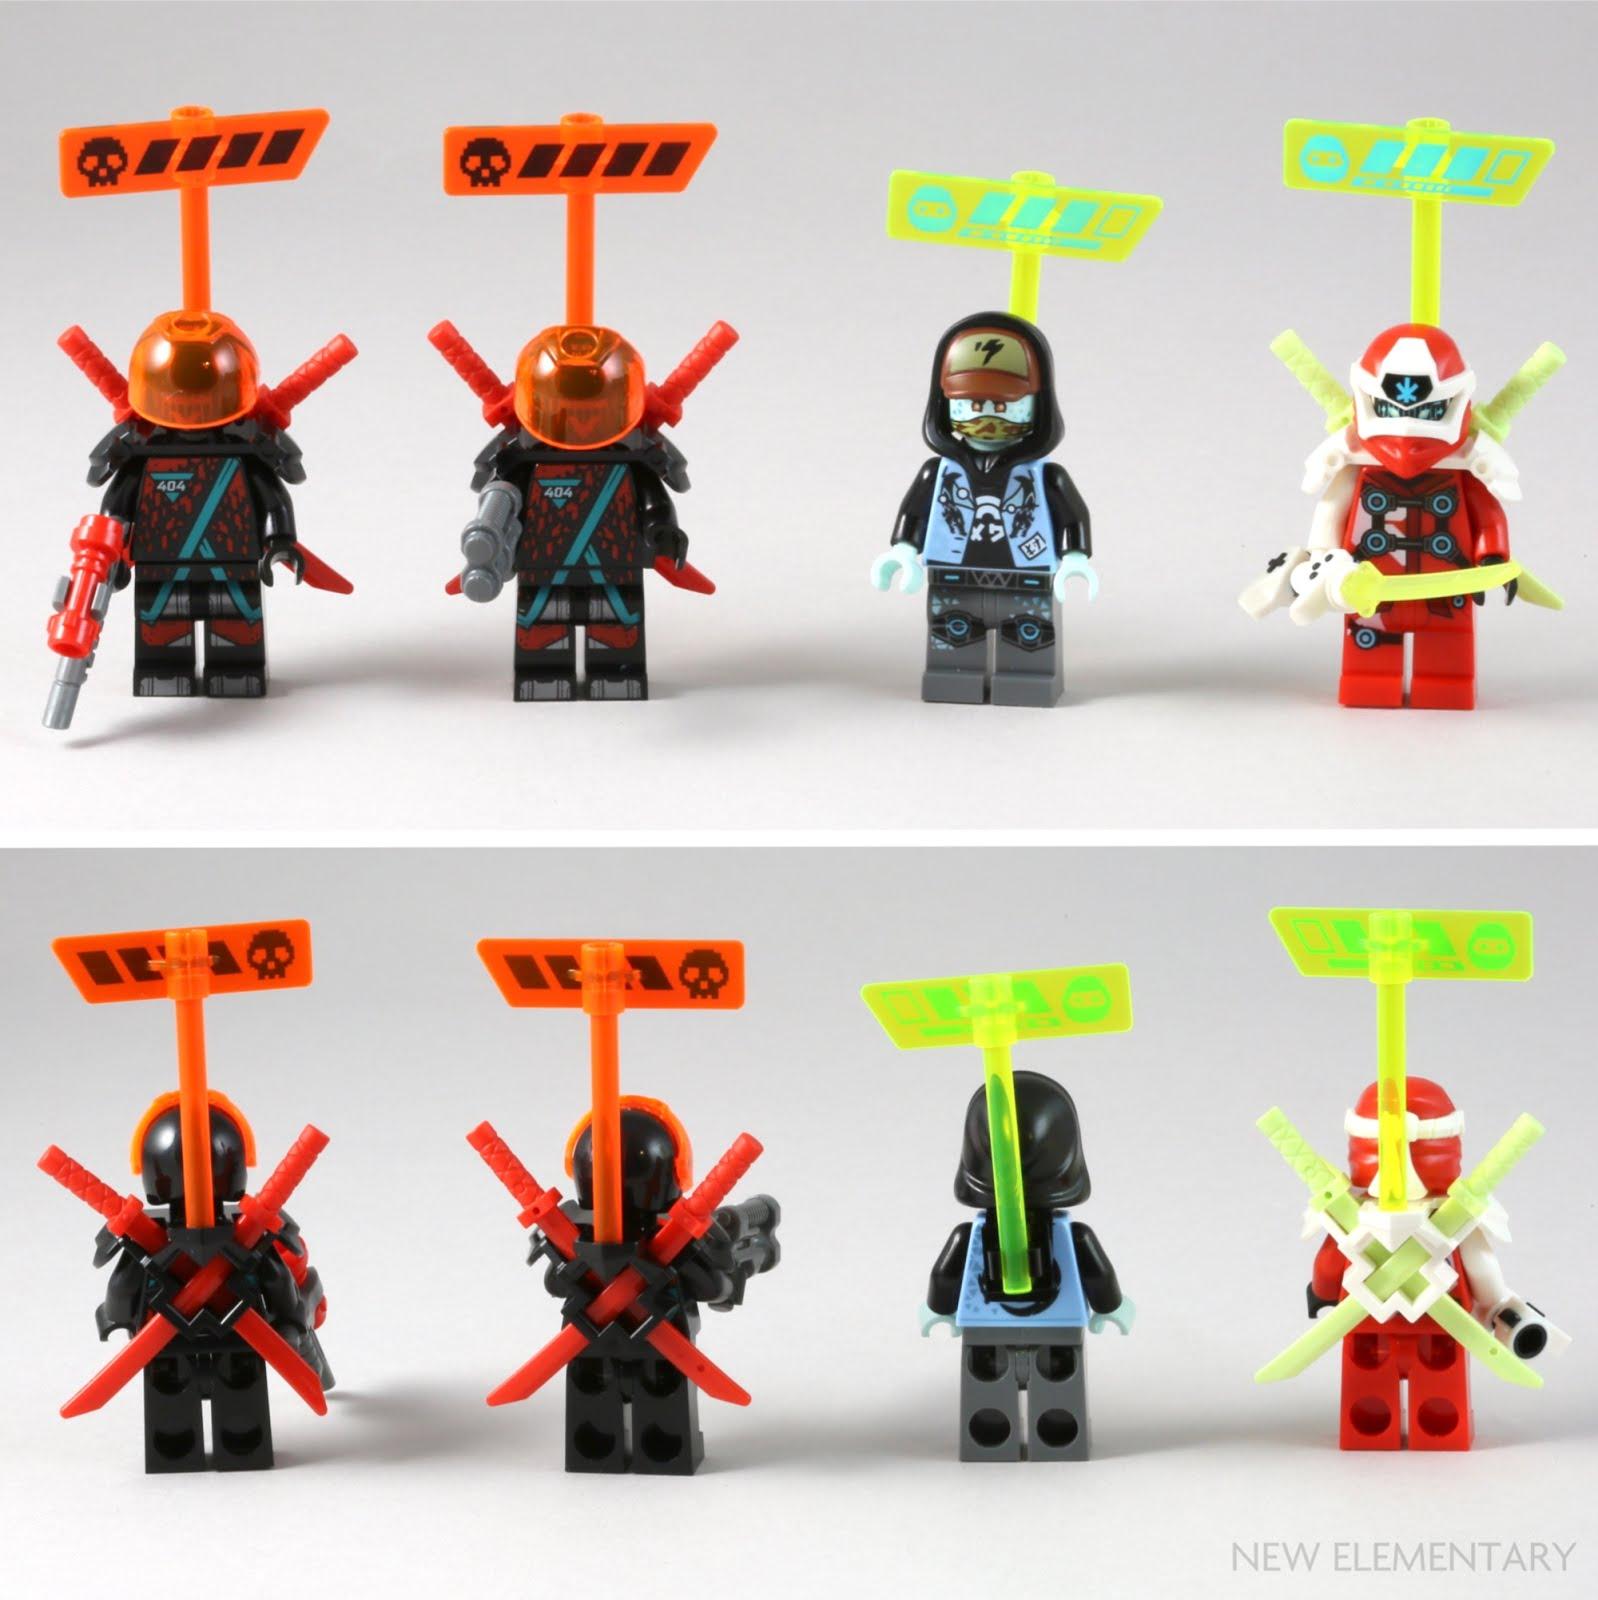 Scott LEGO Ninjago 71710 - Figur Minifigur Digi Avatar Arcade Gamer 71710